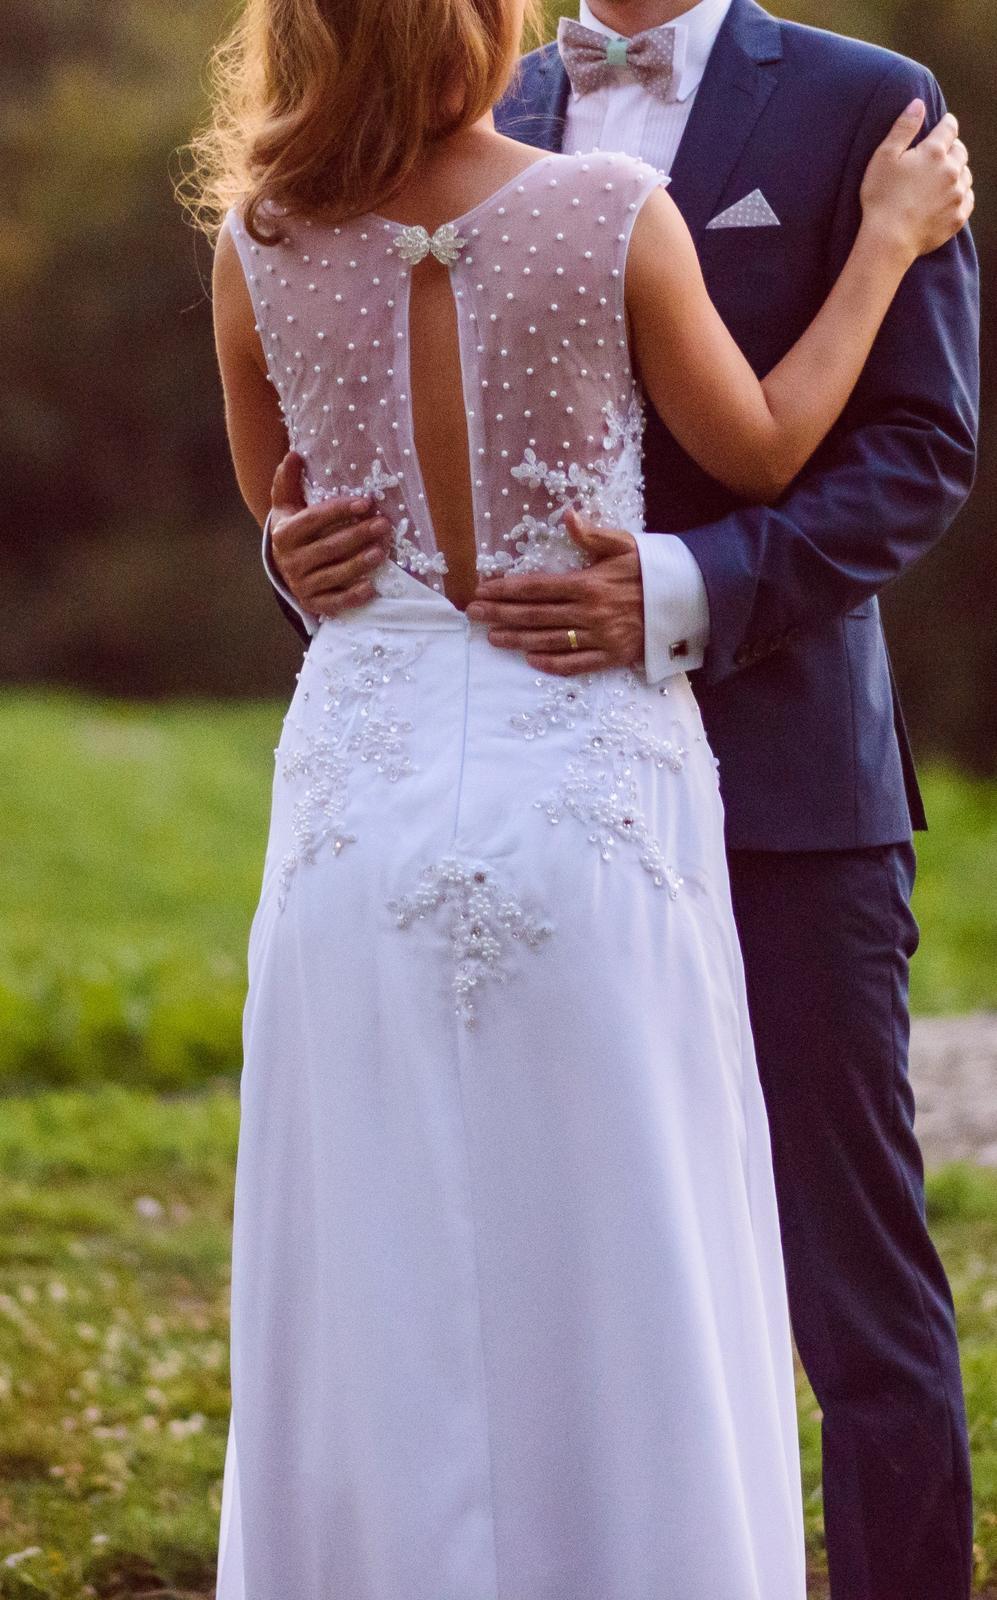 Jednoduché svadobné šaty 9c9facd624e